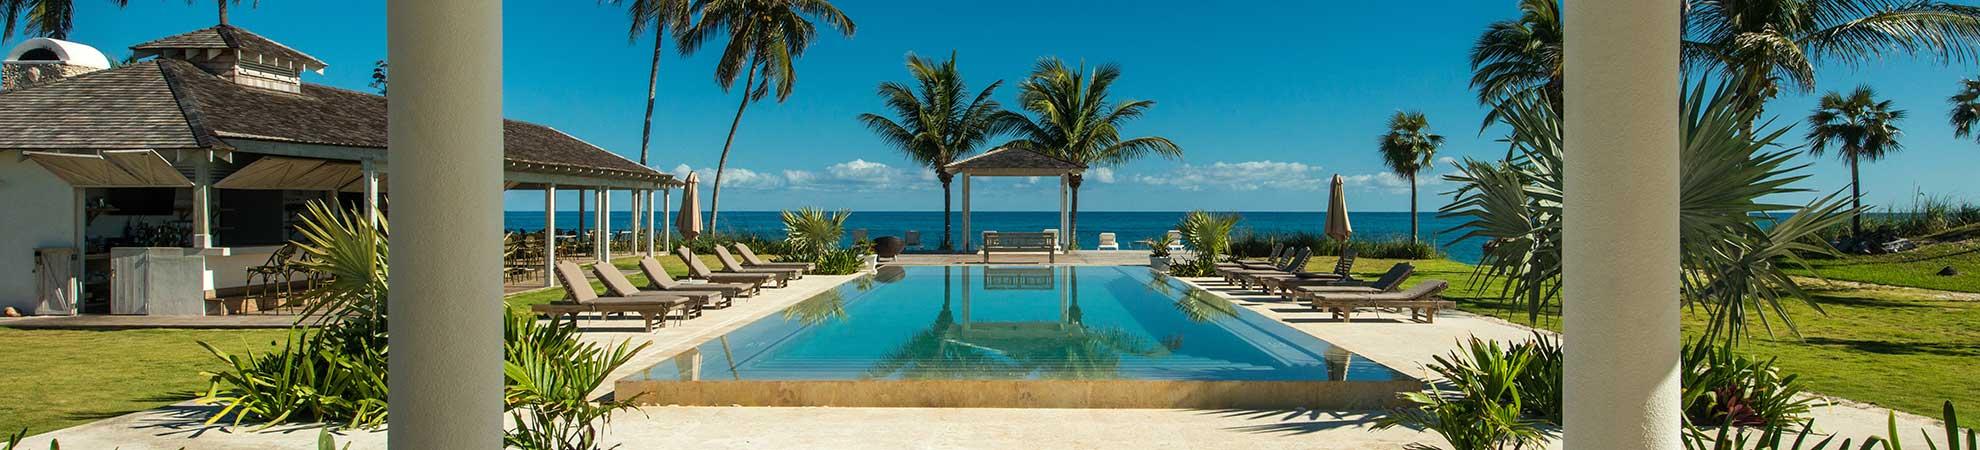 Bahamas hotel luxe